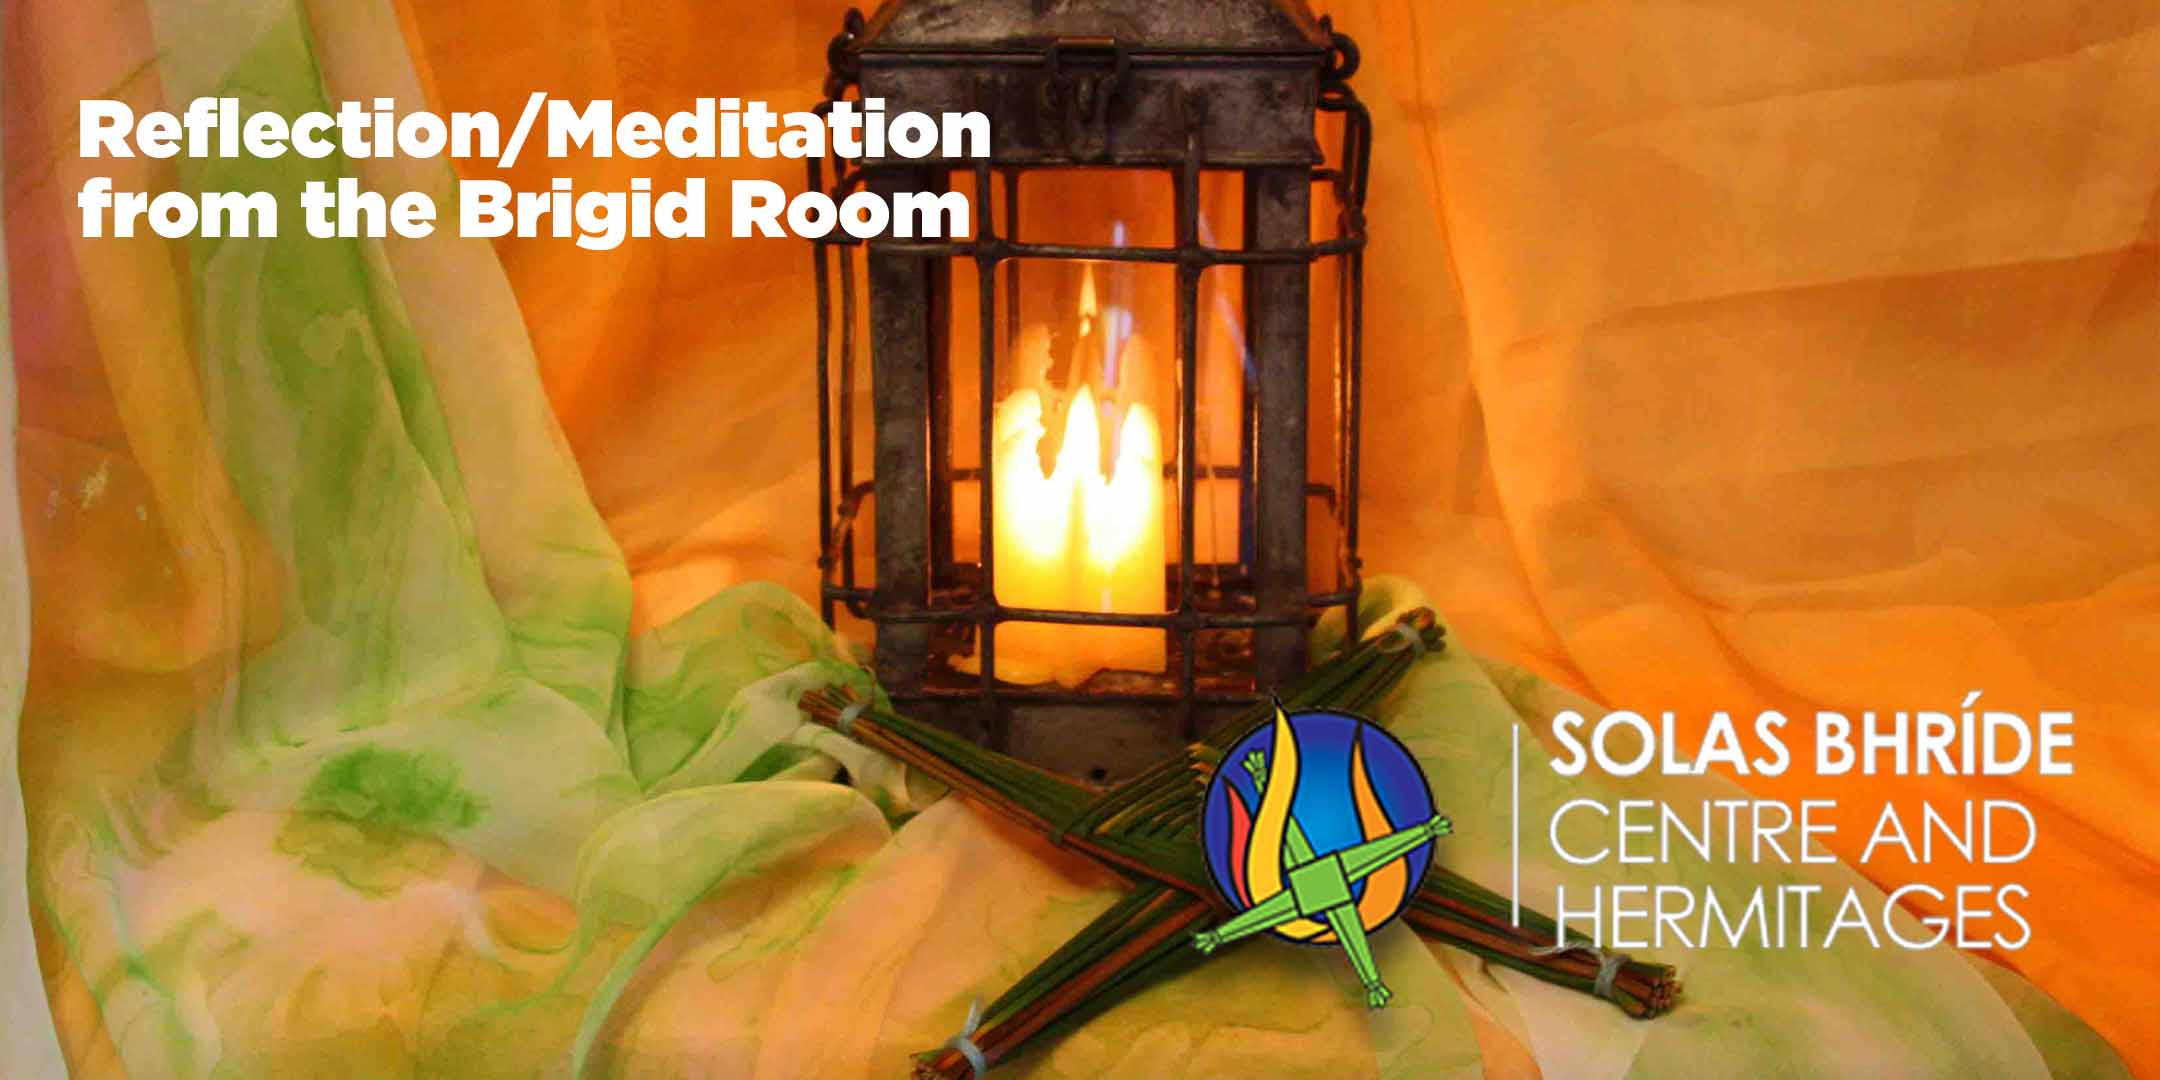 reflection meditation from the brigid room